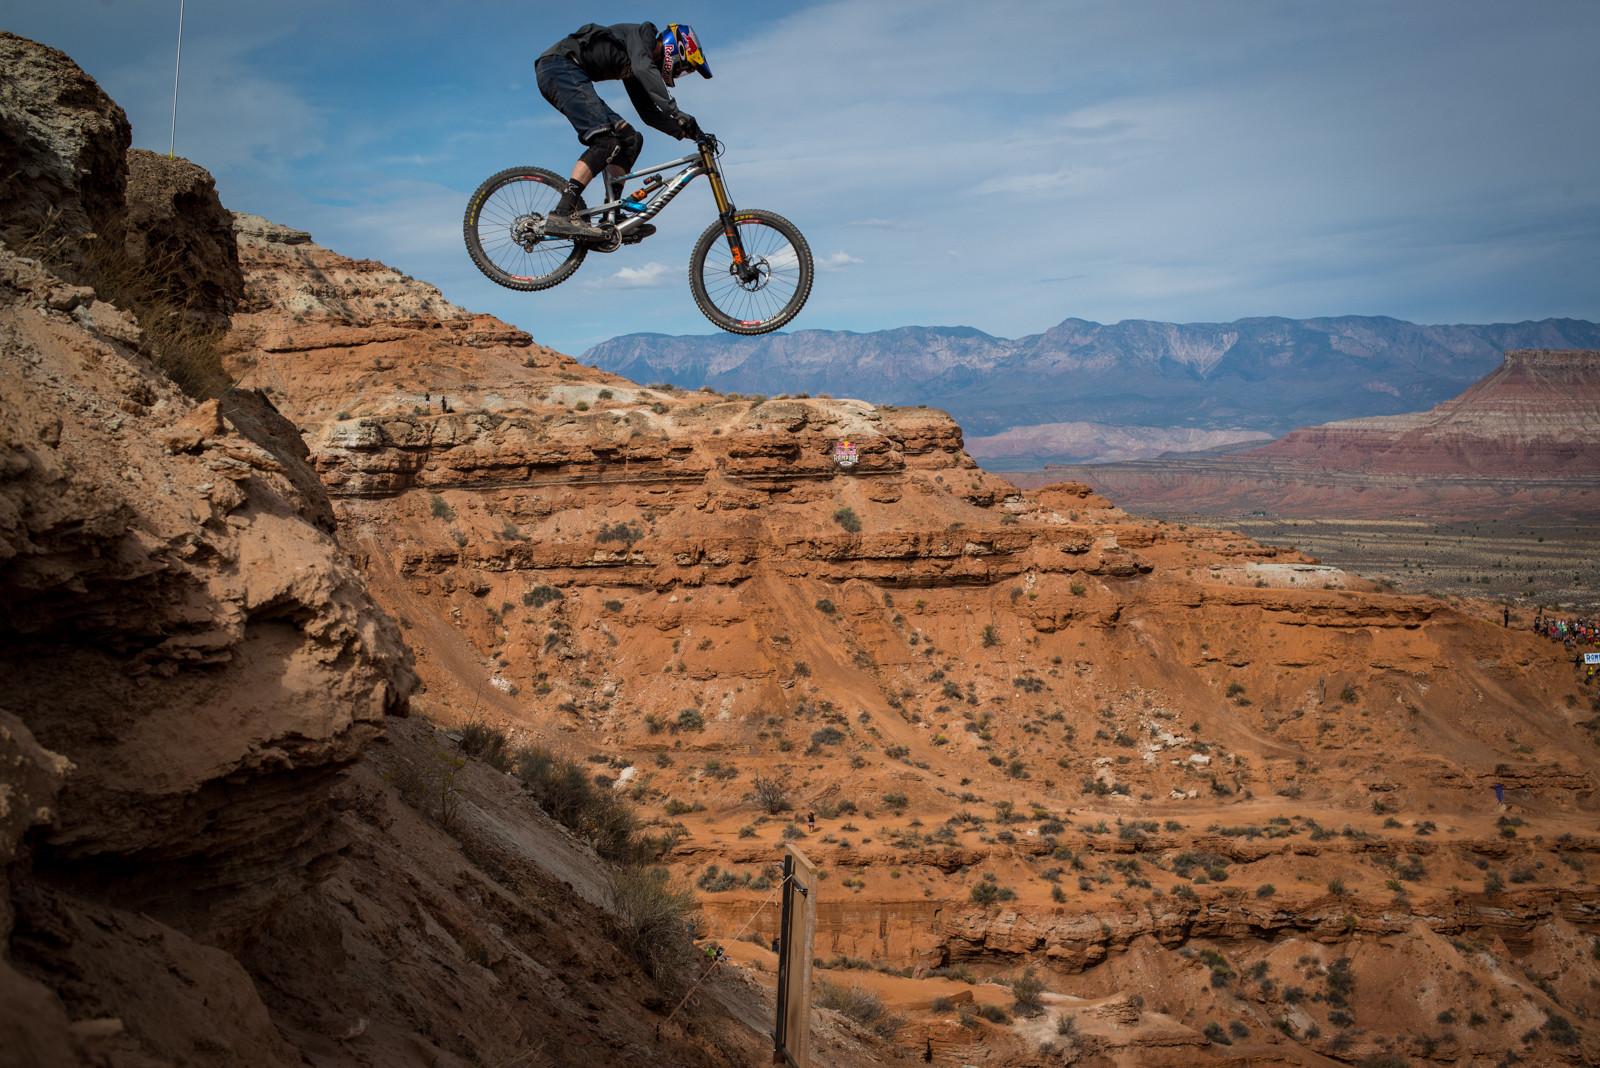 Thomas Genon - 2015 Red Bull Rampage Finals - Mountain Biking Pictures - Vital MTB